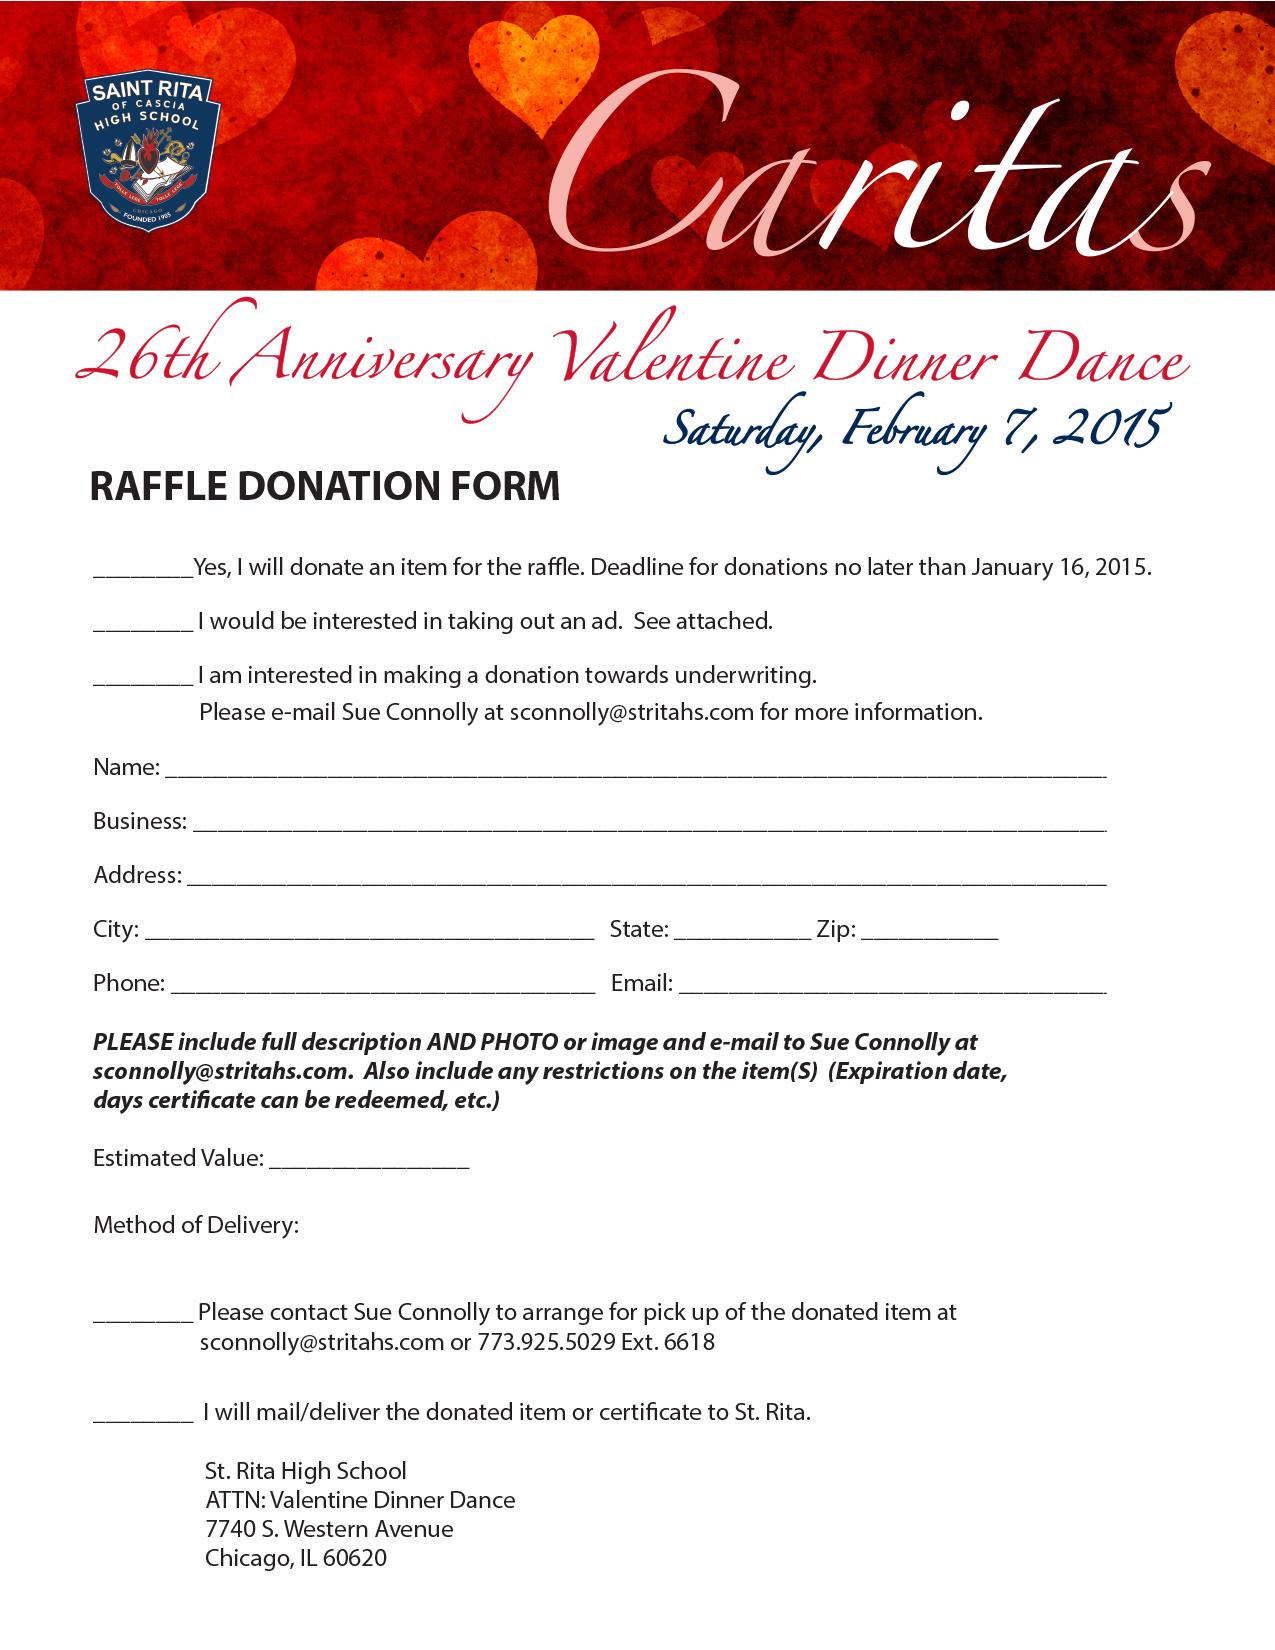 CARITAS DONATION FORM